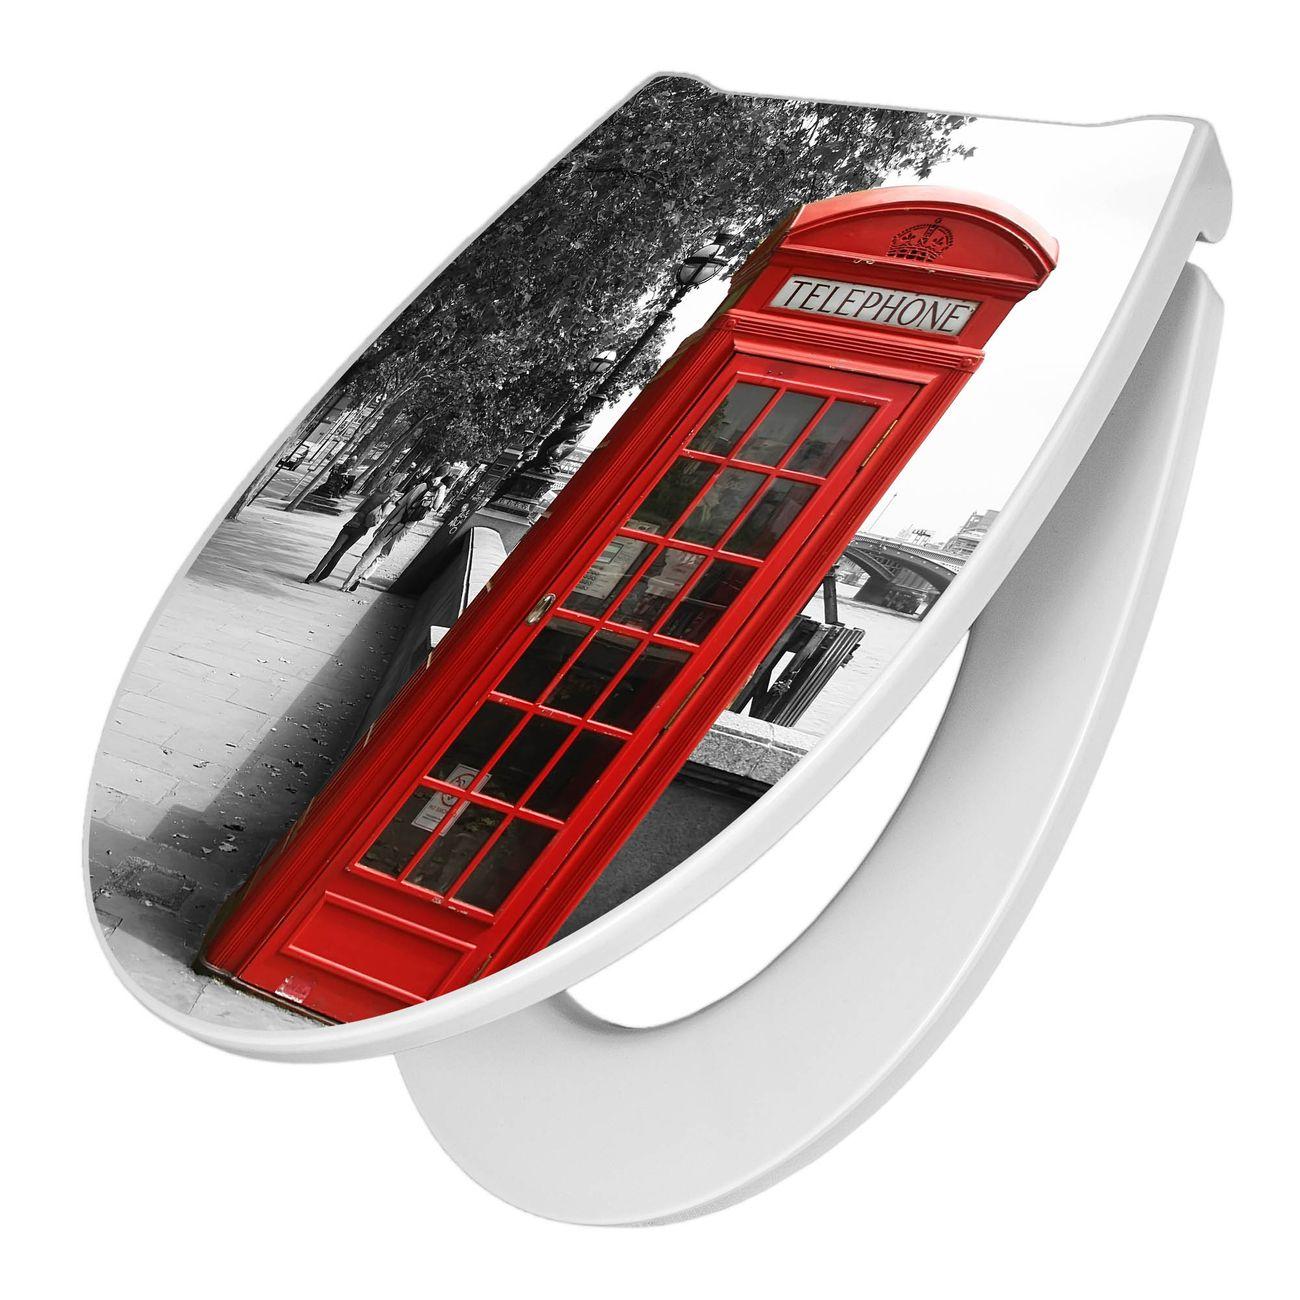 Premium WC-Sitz Softclose Absenkautomatik Motiv London Red Telephone